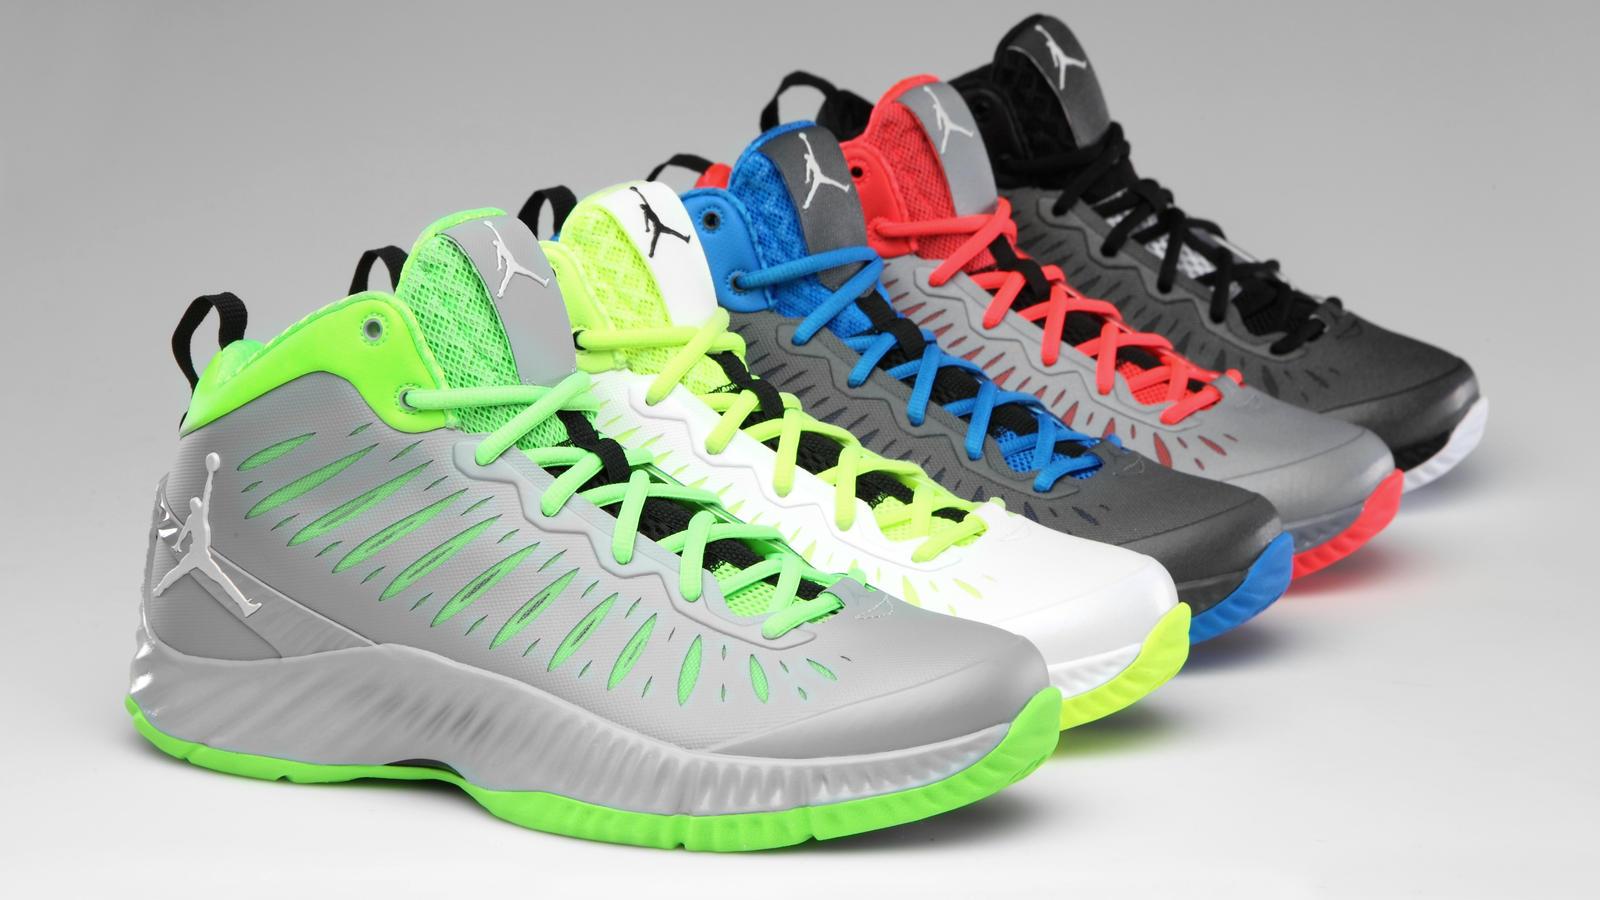 Flight with the Jordan Super.Fly - Nike